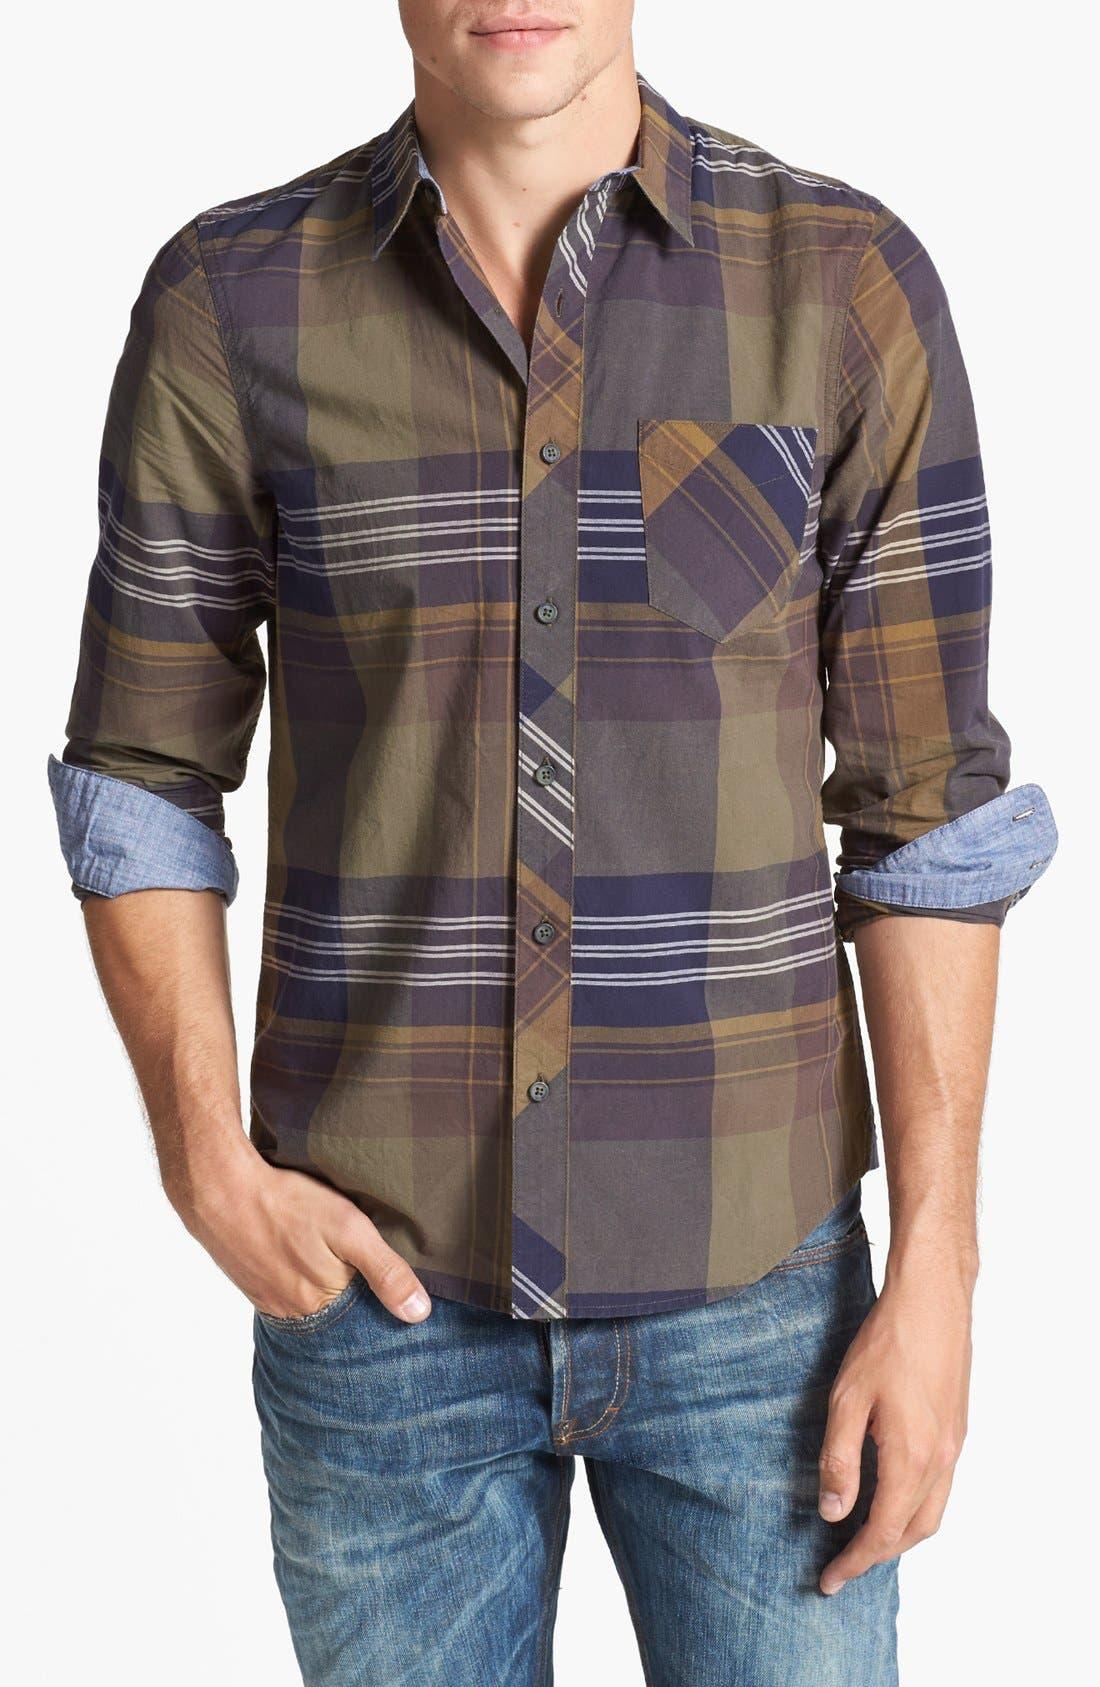 Alternate Image 1 Selected - 1901 Plaid Poplin Shirt